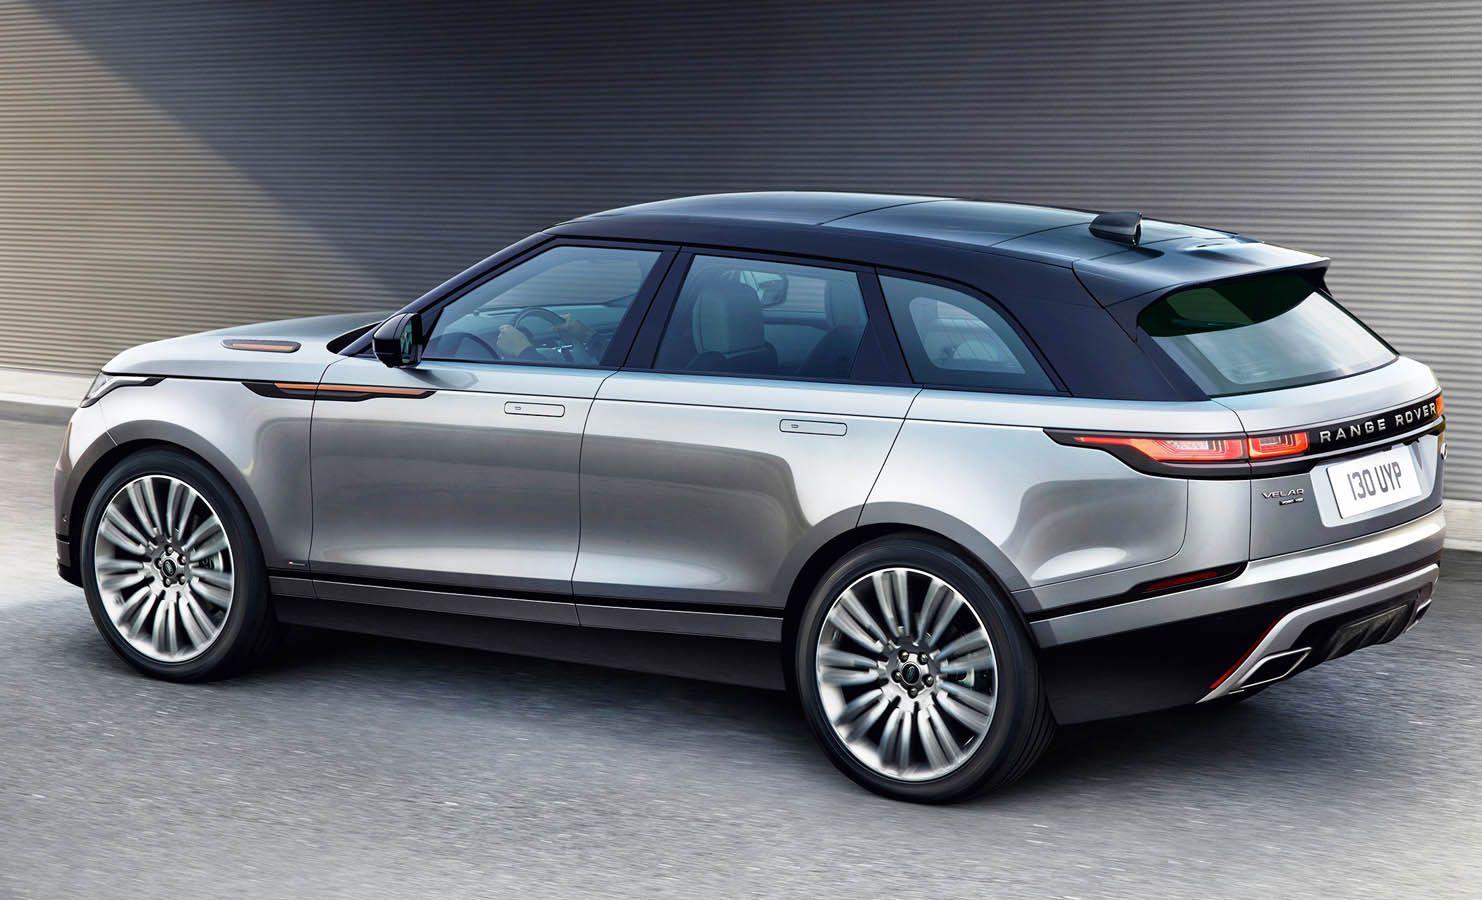 Pin By Derekharper On Range Rover In 2020 Range Rover Best Luxury Cars Land Rover